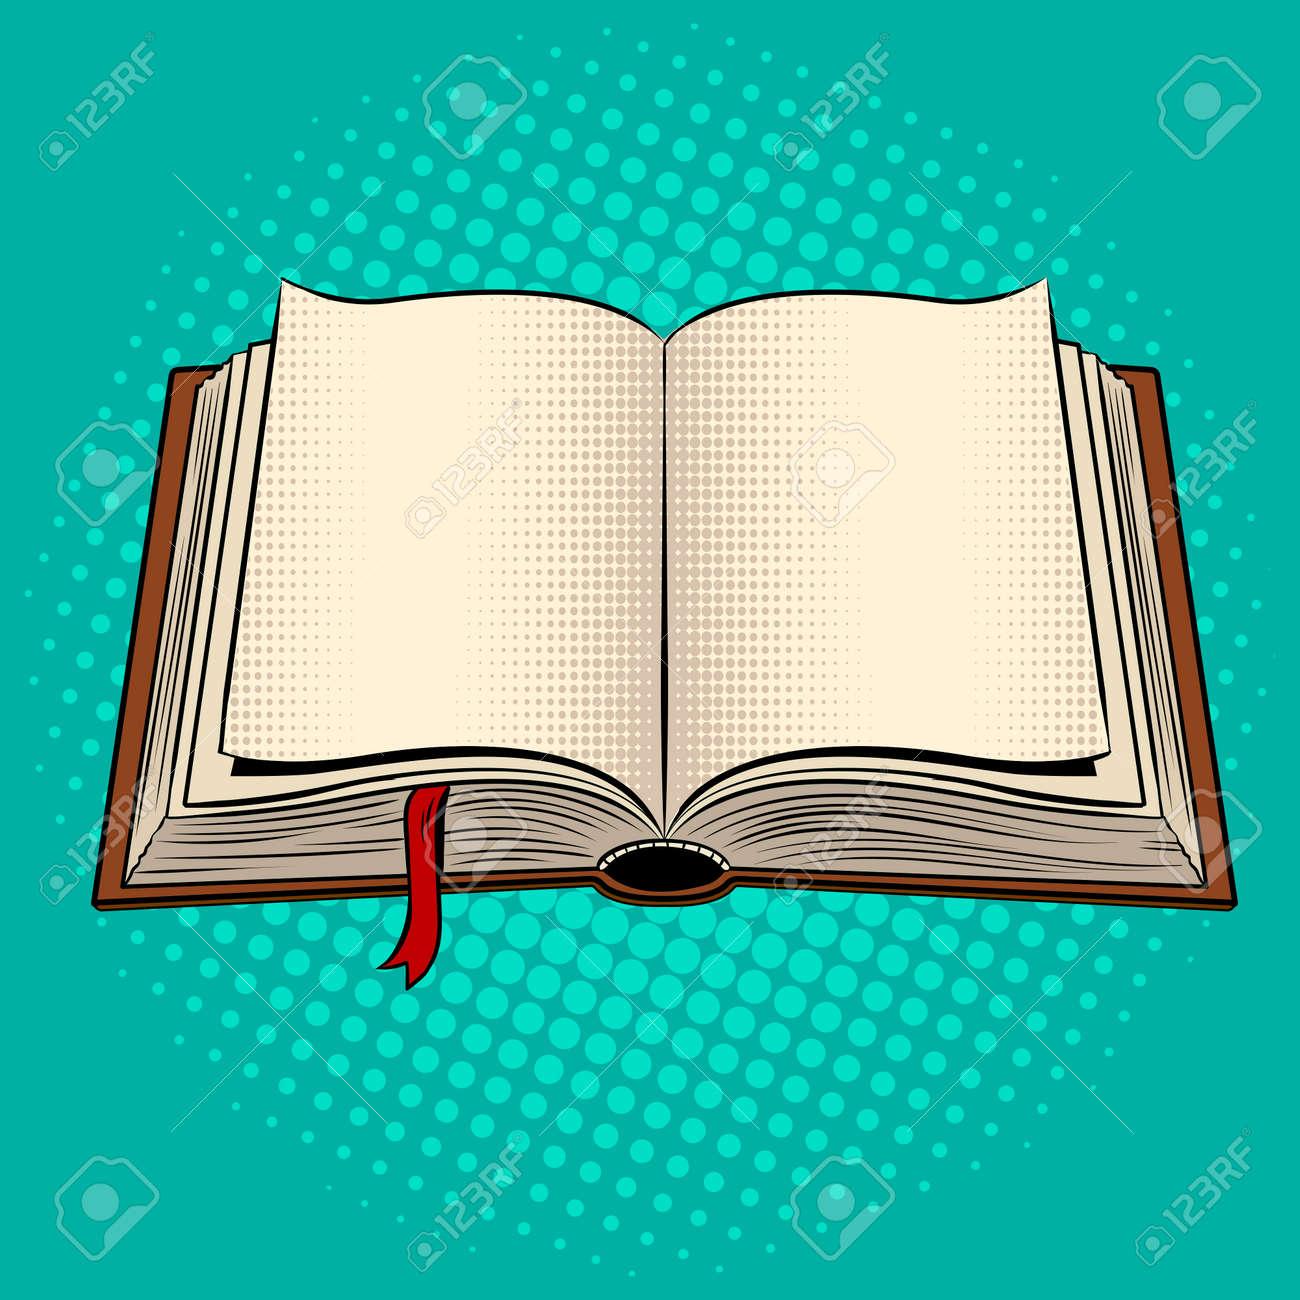 Open book pop art vector illustration. - 92510827